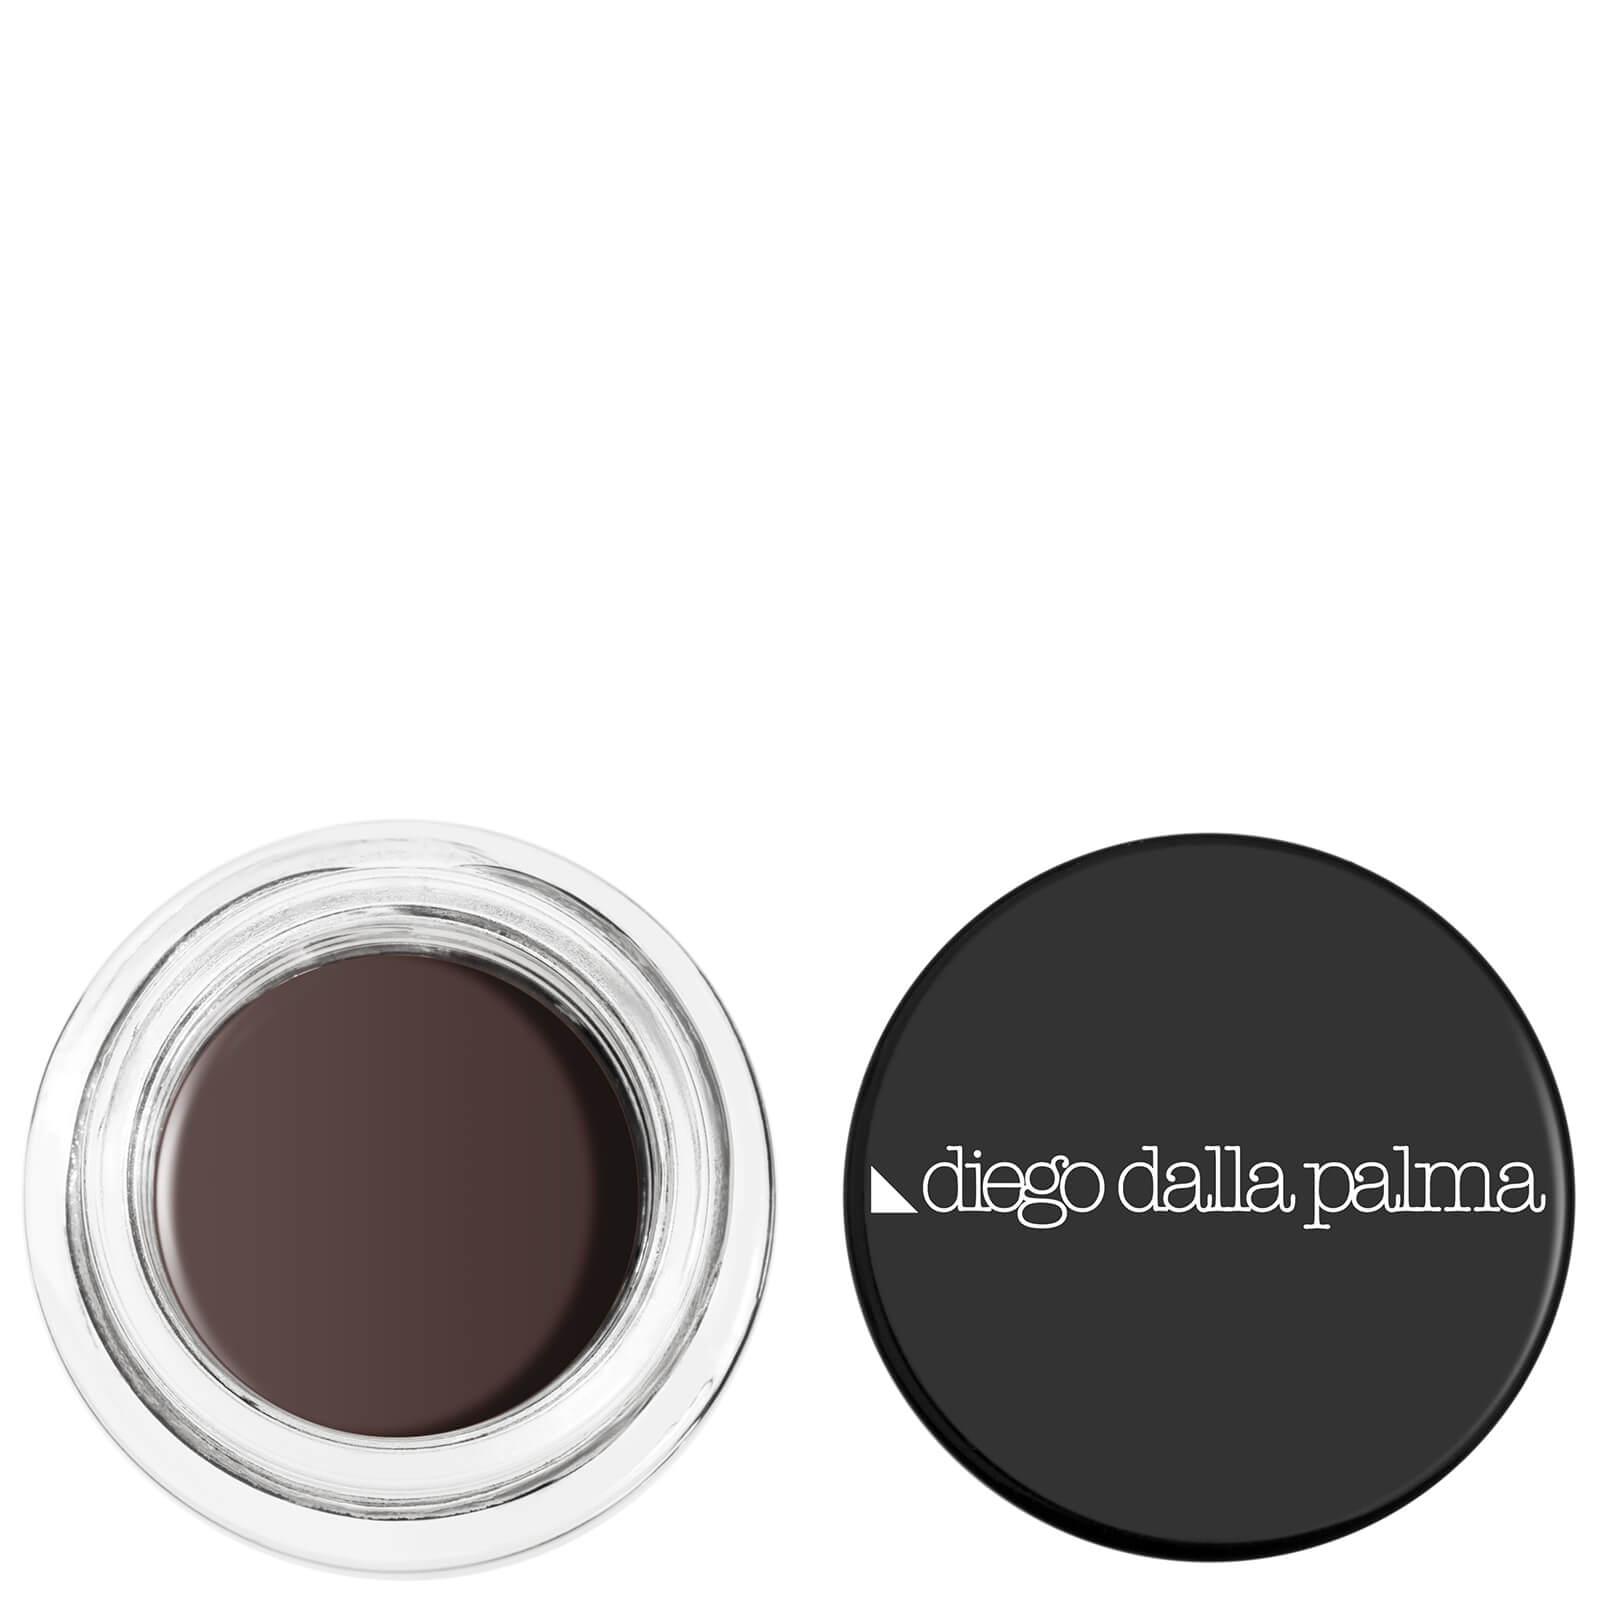 Diego Dalla Palma Cream Water Resistant Eyebrow Liner 4ml (Various Shades) - Deep Dark